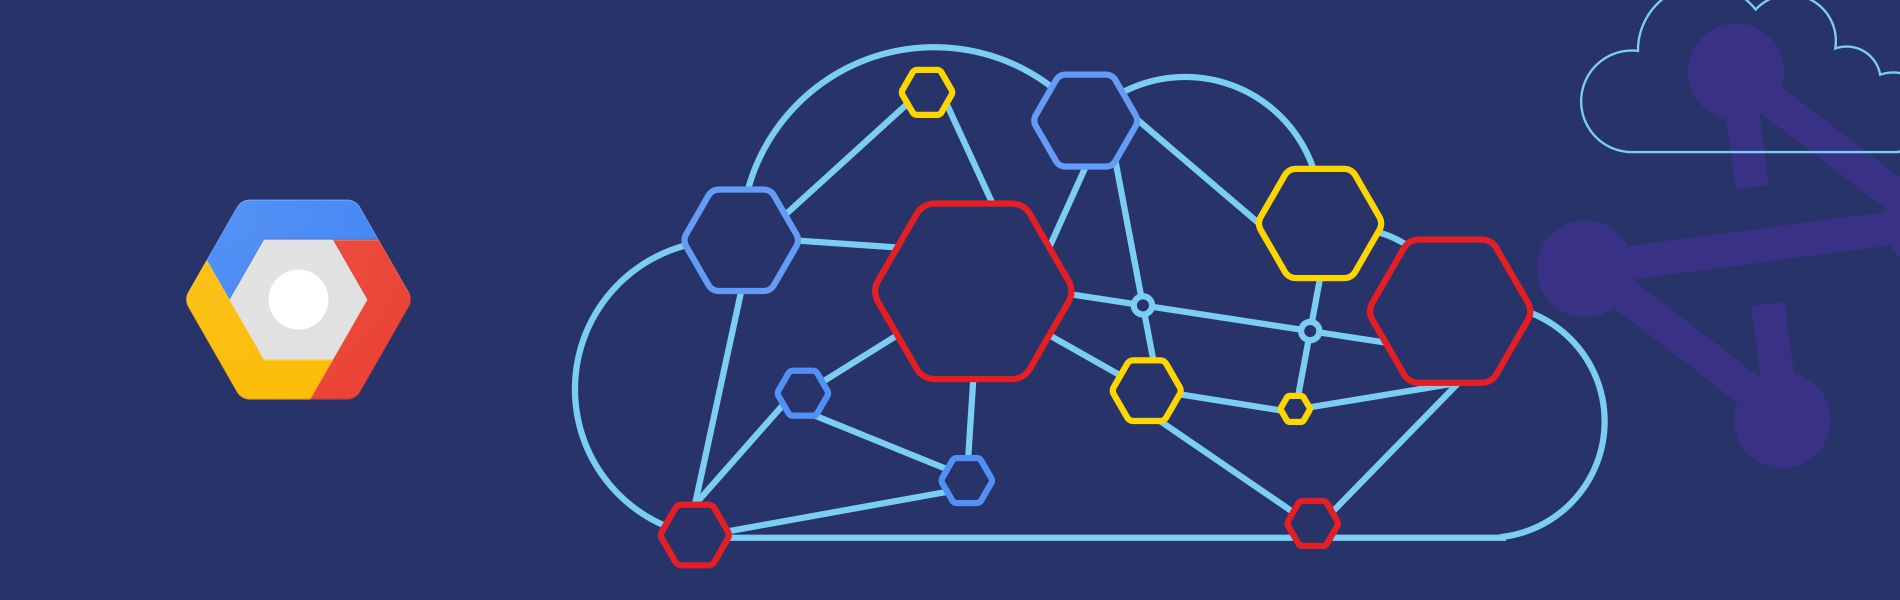 Blog-Header-Concepts-of-Networking-in-Google-Cloud-Platform-1900x600